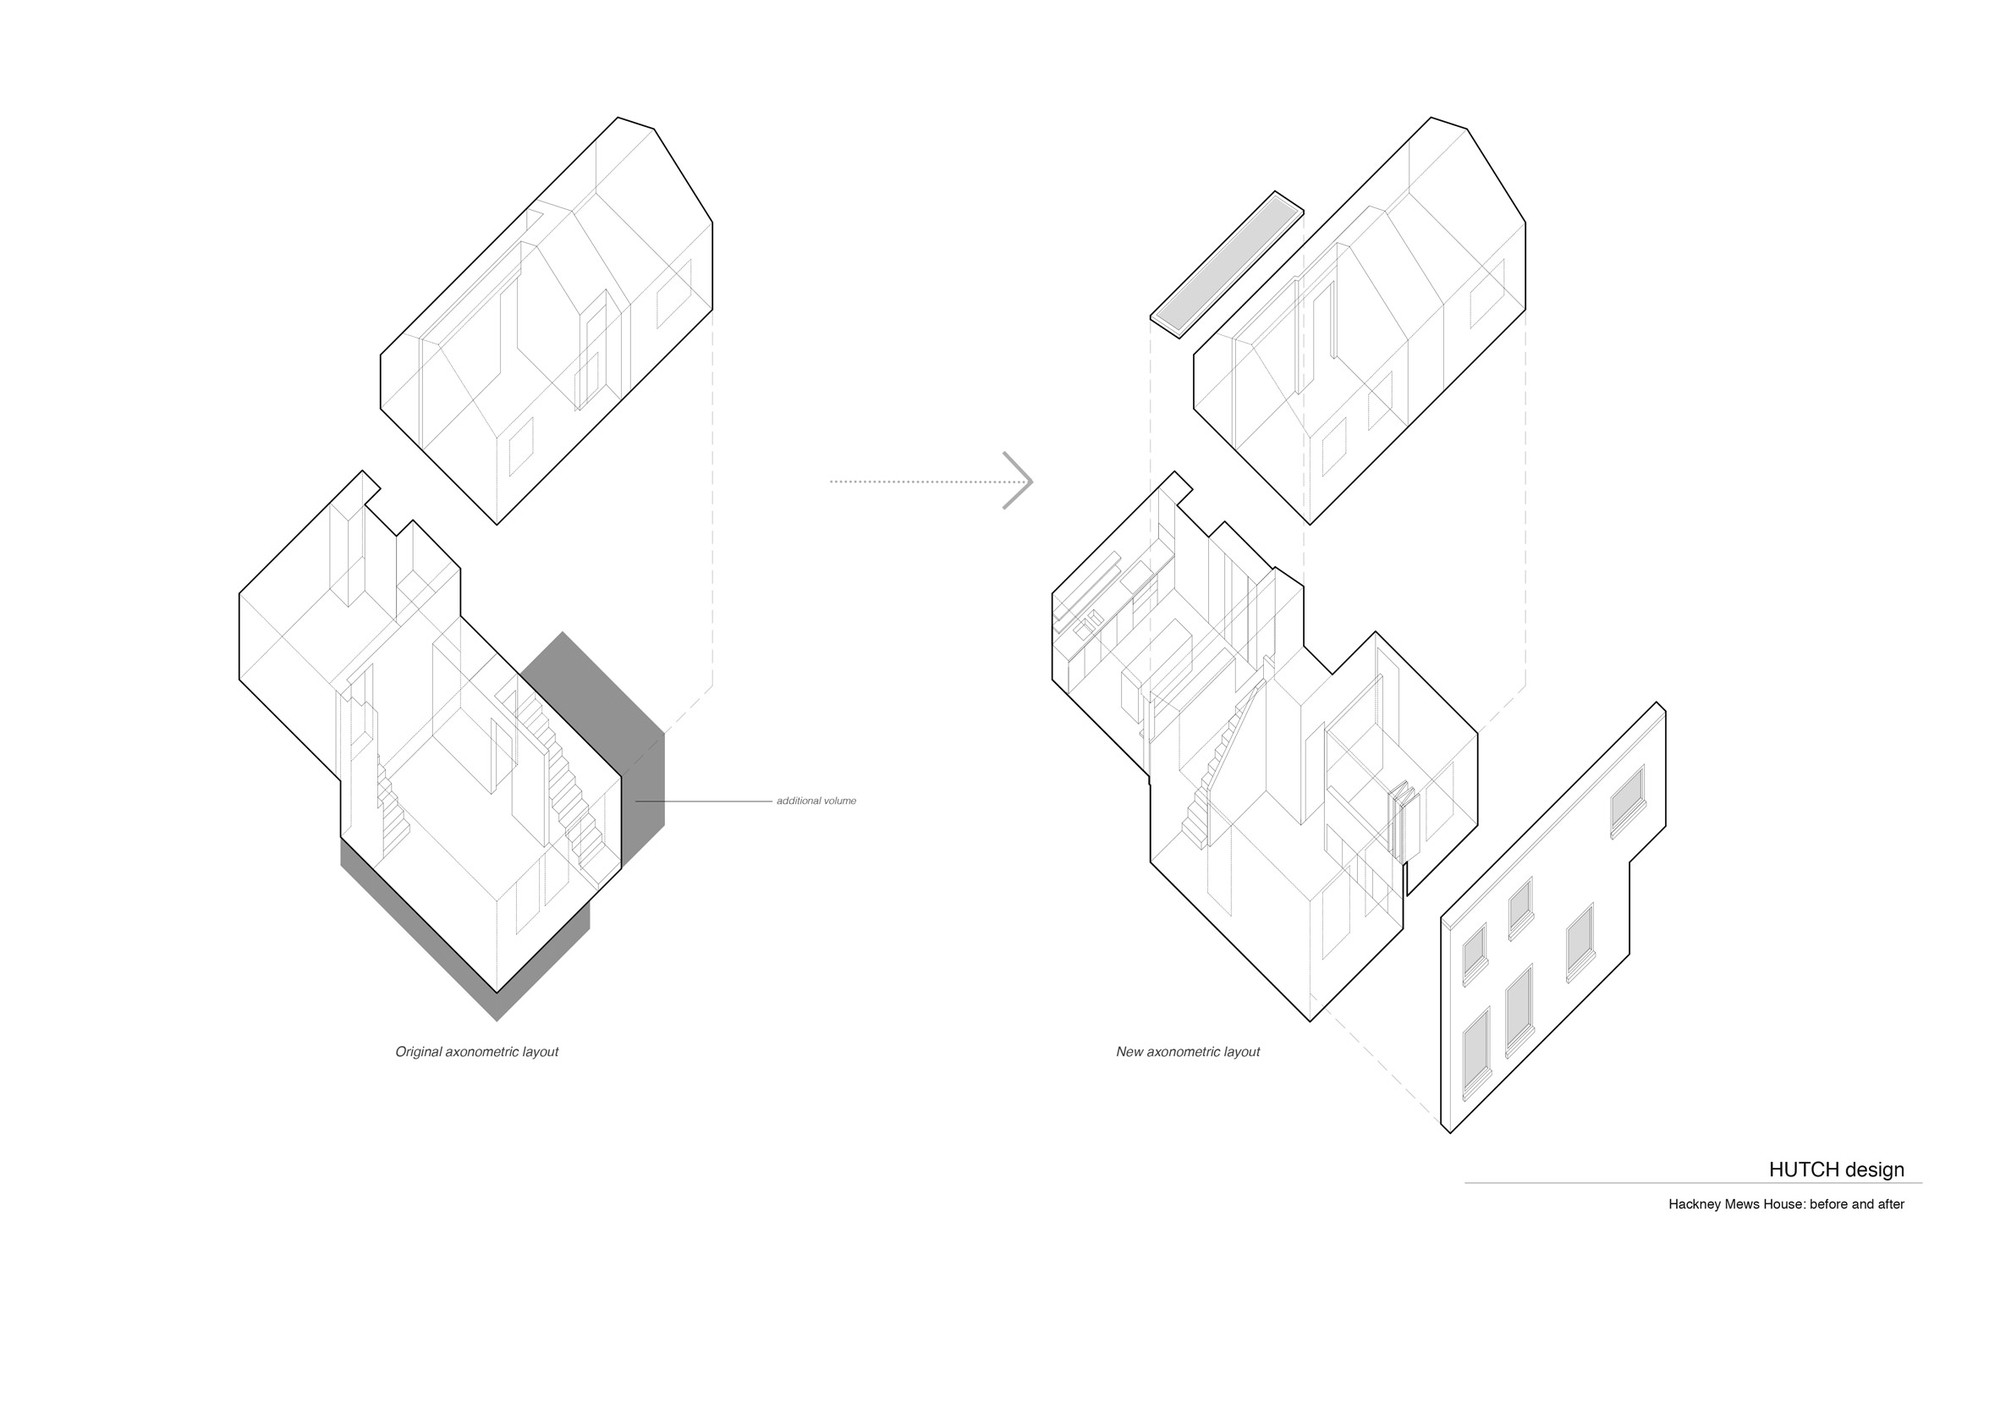 hackney-mews-hutch-design-london-architecture-_dezeen_2364_axo